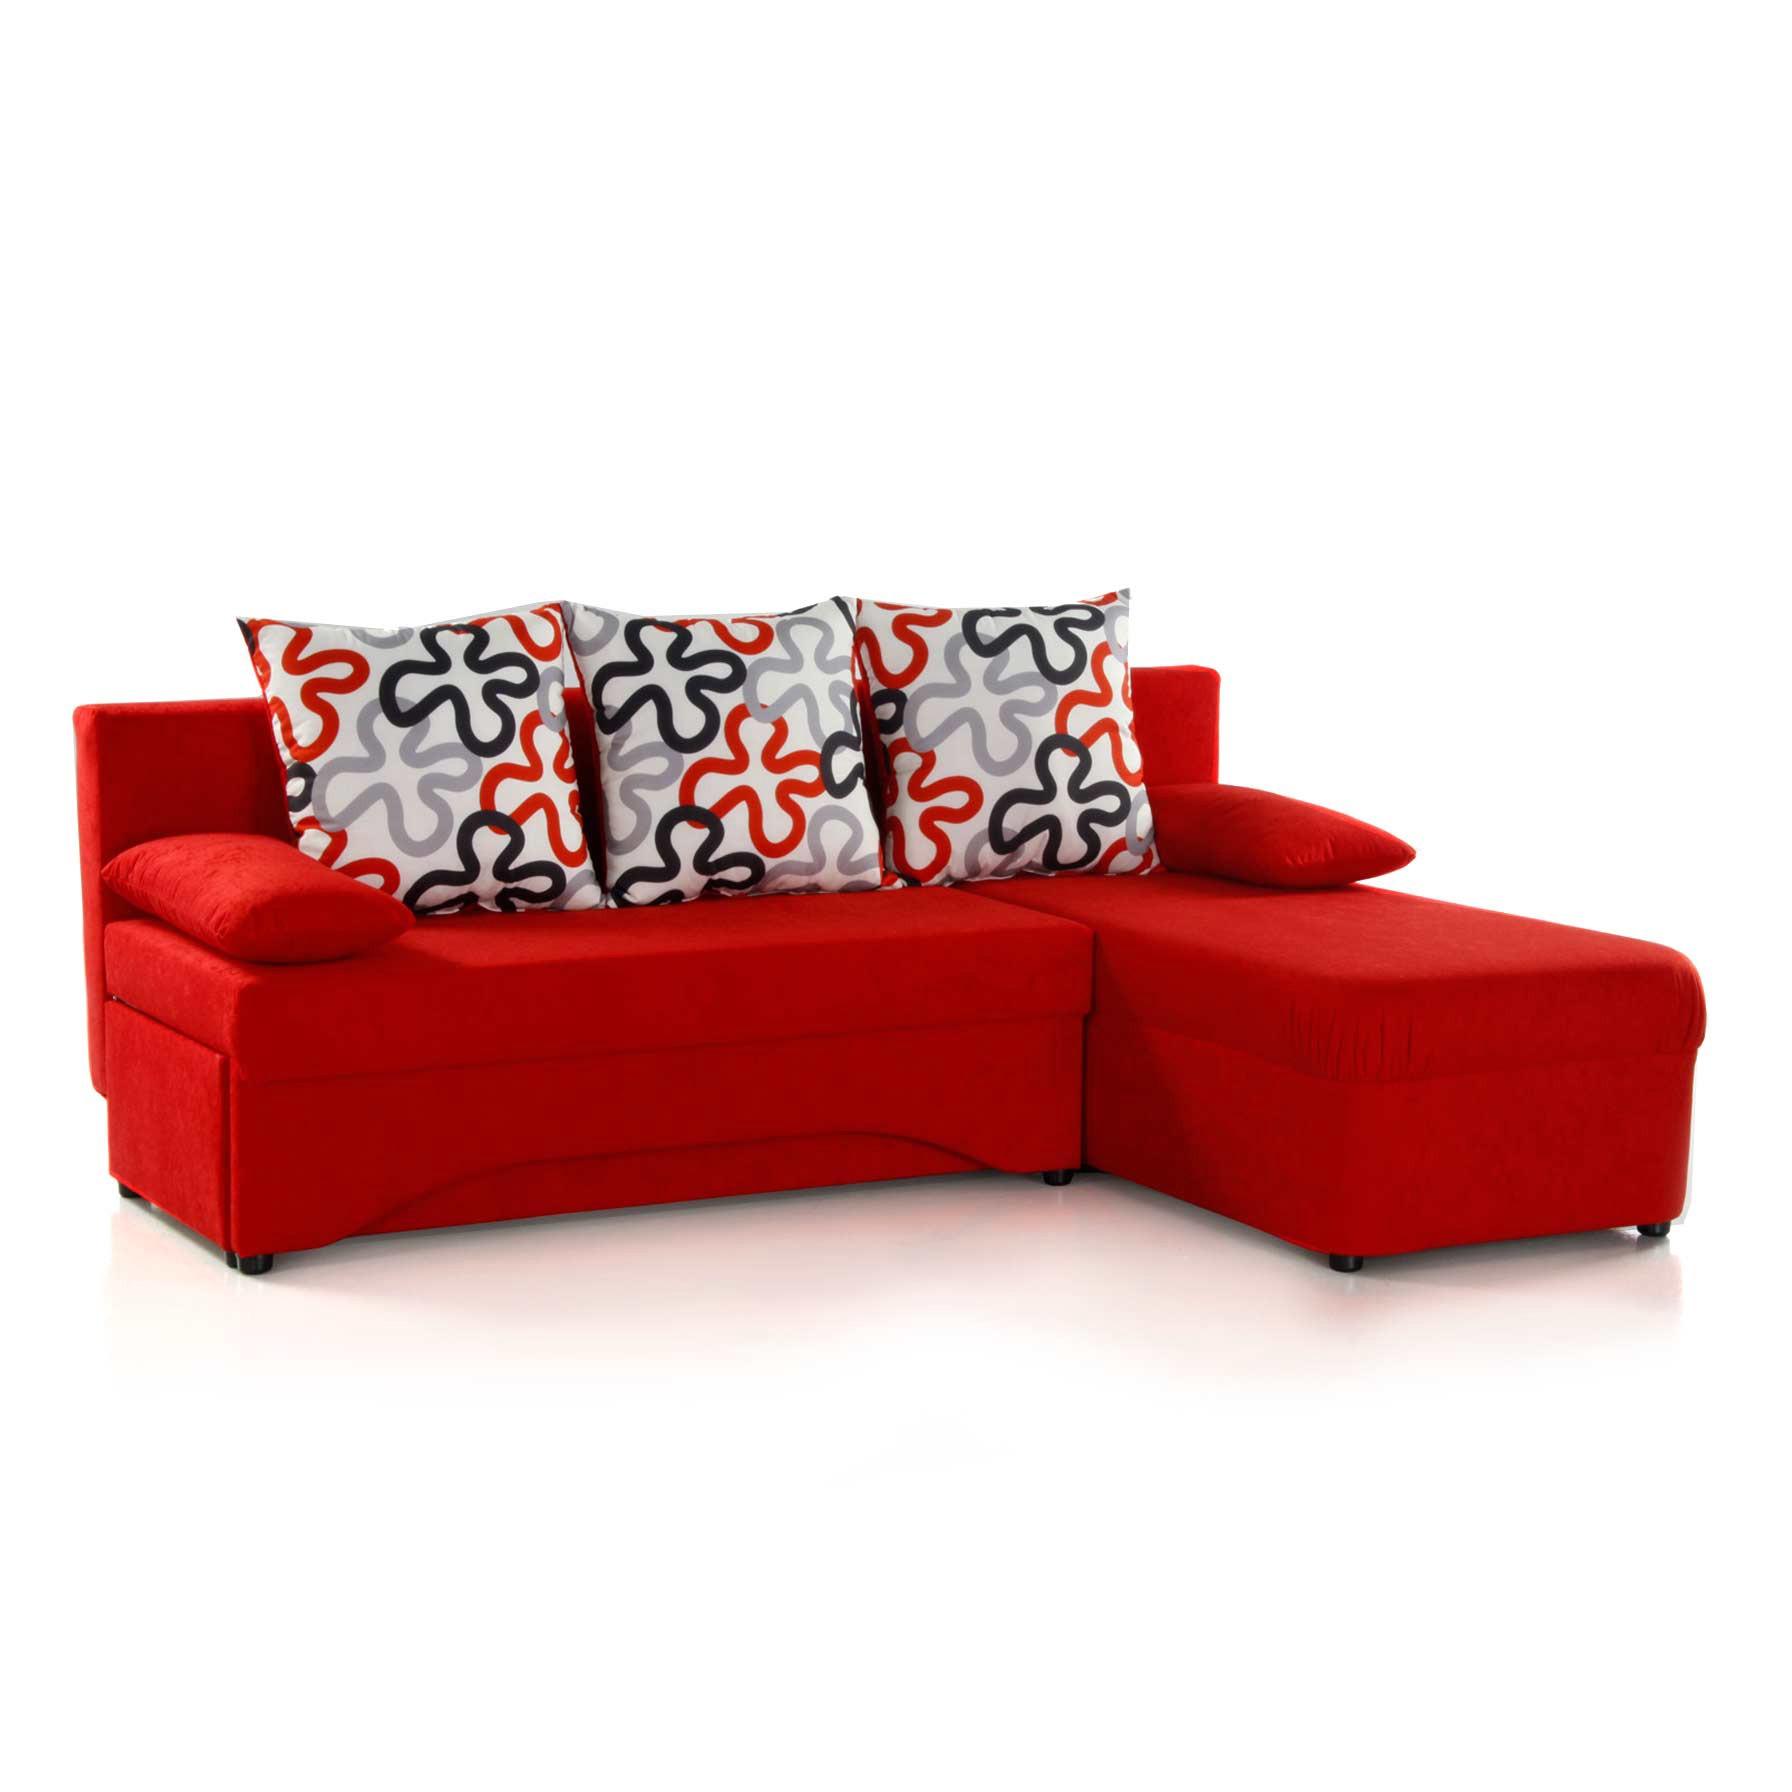 Pula Ecksofa - Microfaser Rot -, Home Design